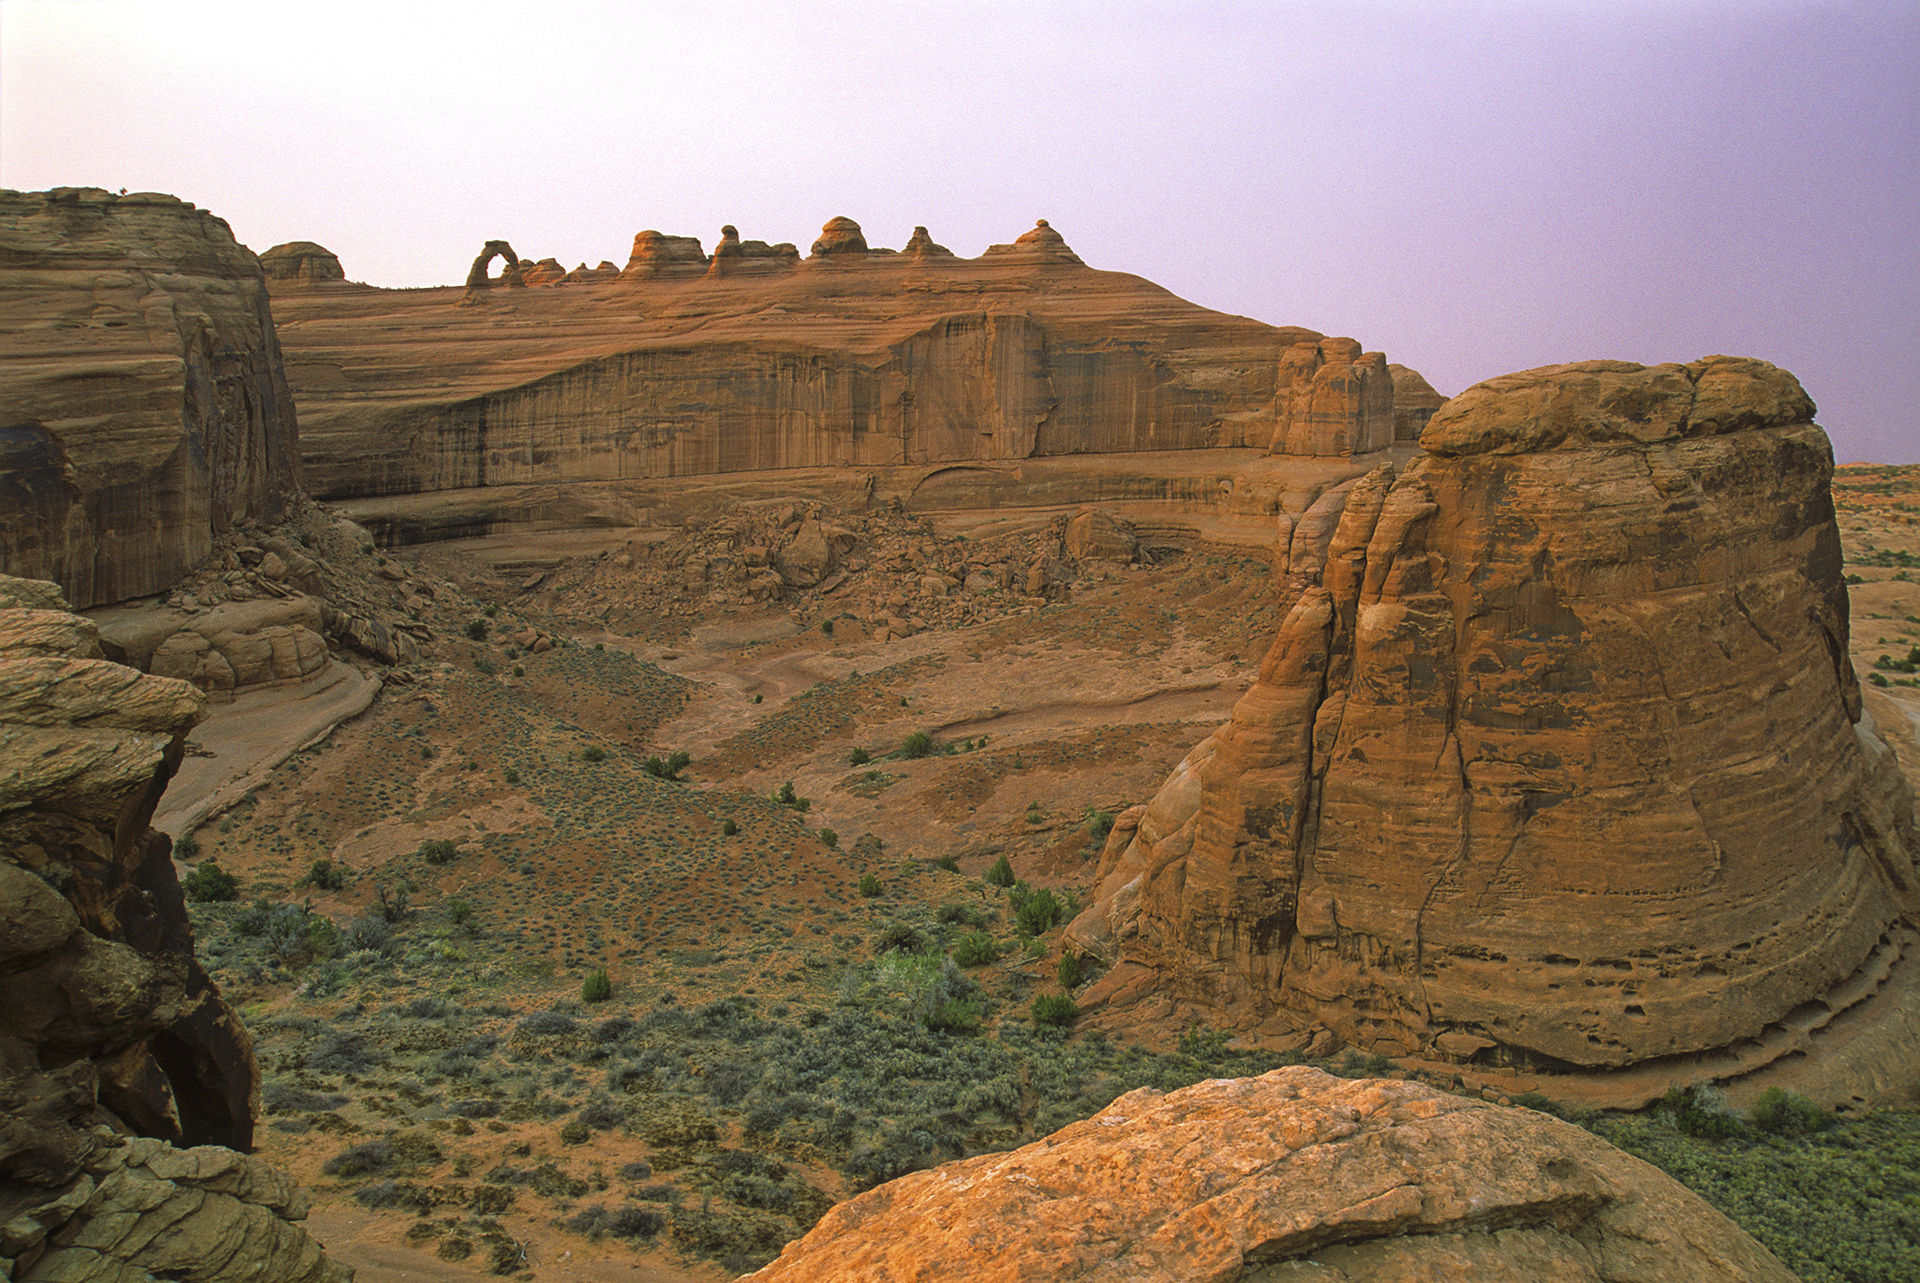 Arcos Parque Nacional, Moab, Utah